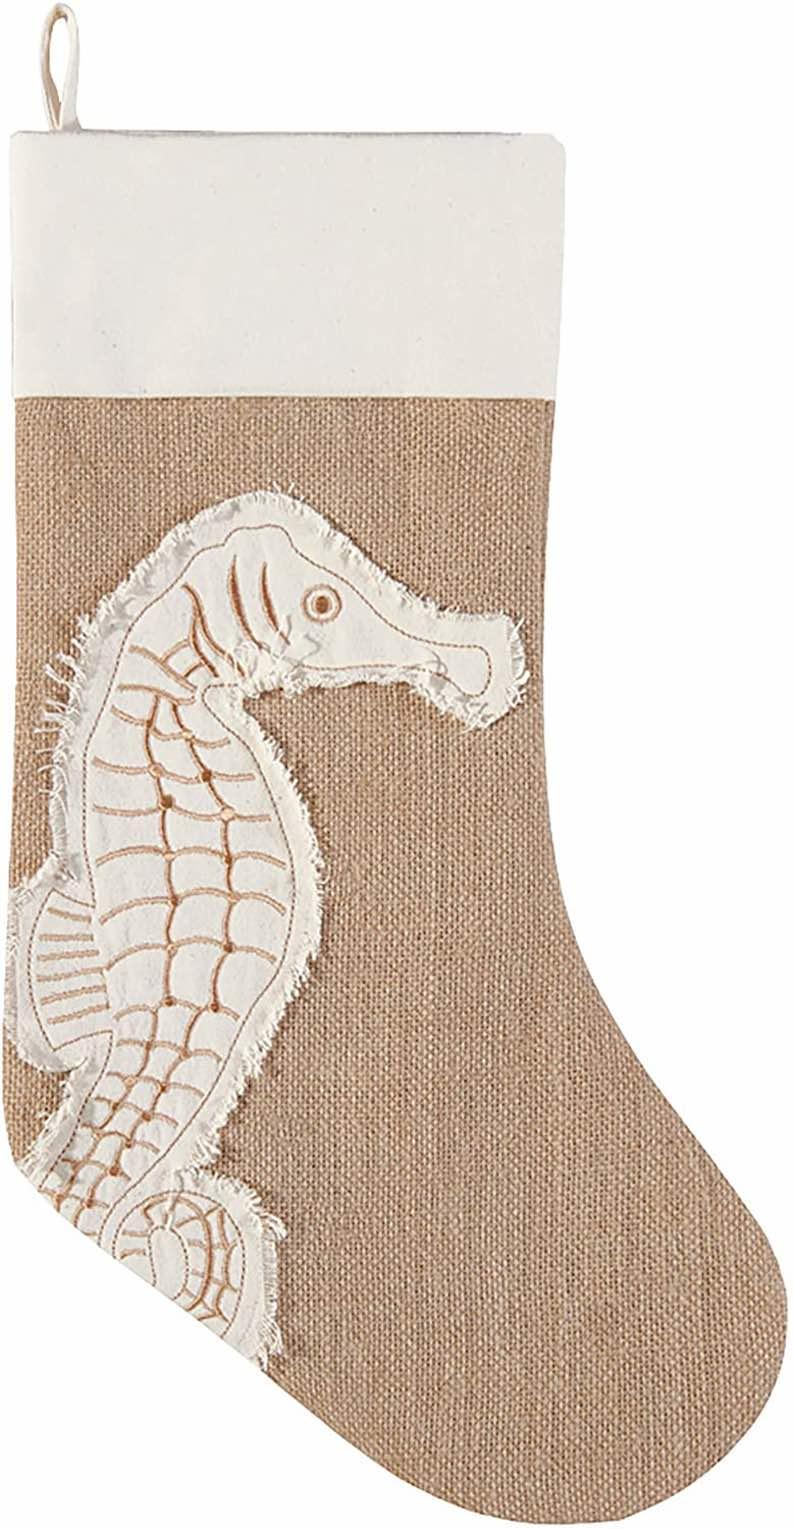 Merry Coastmas Seahorse Stocking